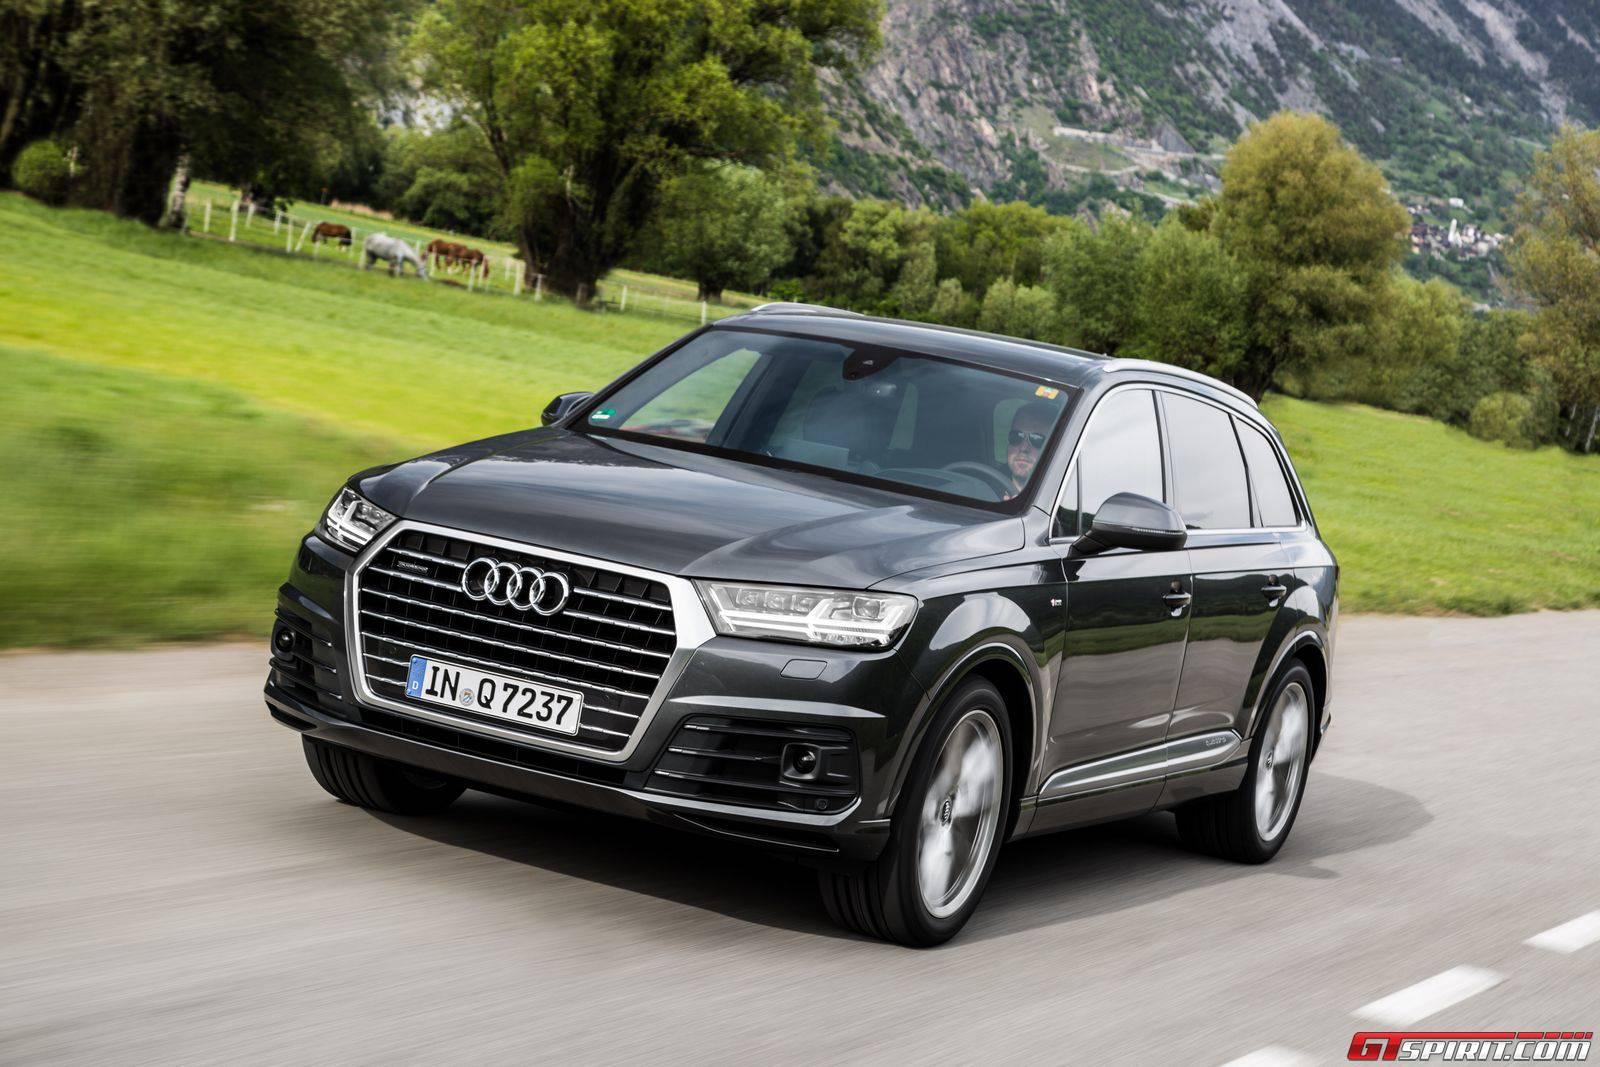 audi daytona gray review 2017 2018 best cars reviews. Black Bedroom Furniture Sets. Home Design Ideas